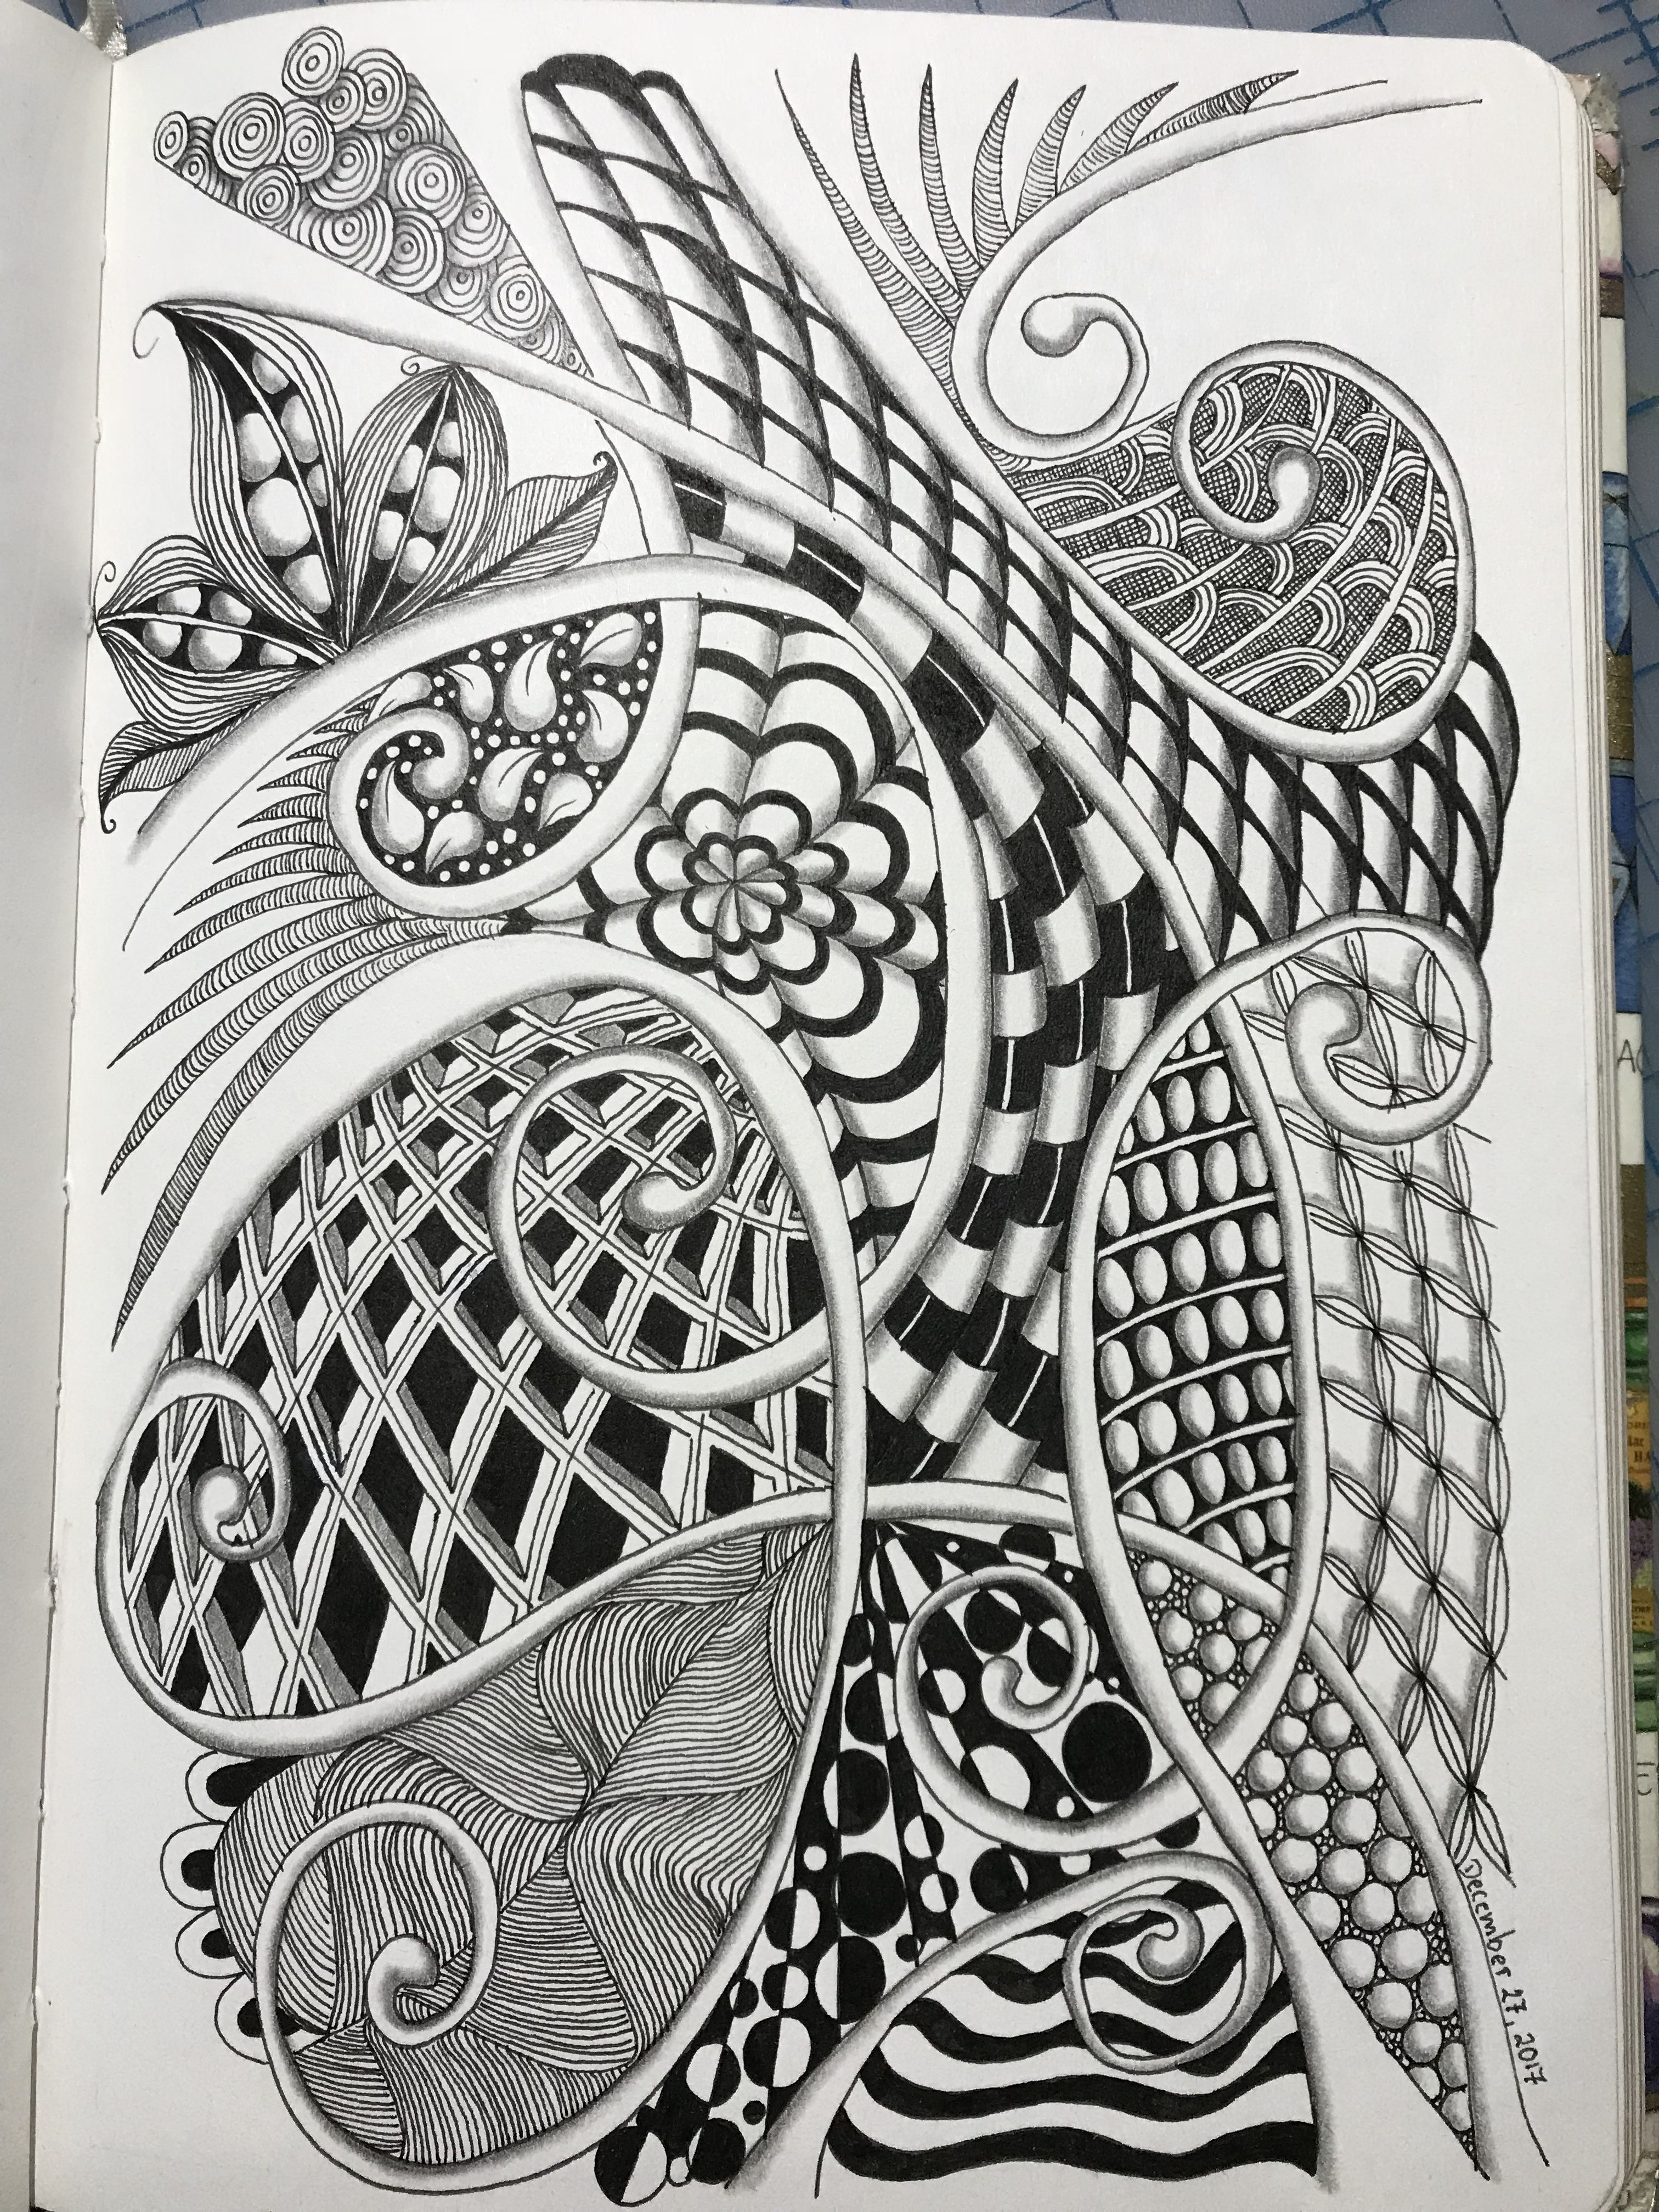 Pin By Gabriela Grasso On My Zia Works Zentangle Drawings Zen Art Drawing Prints